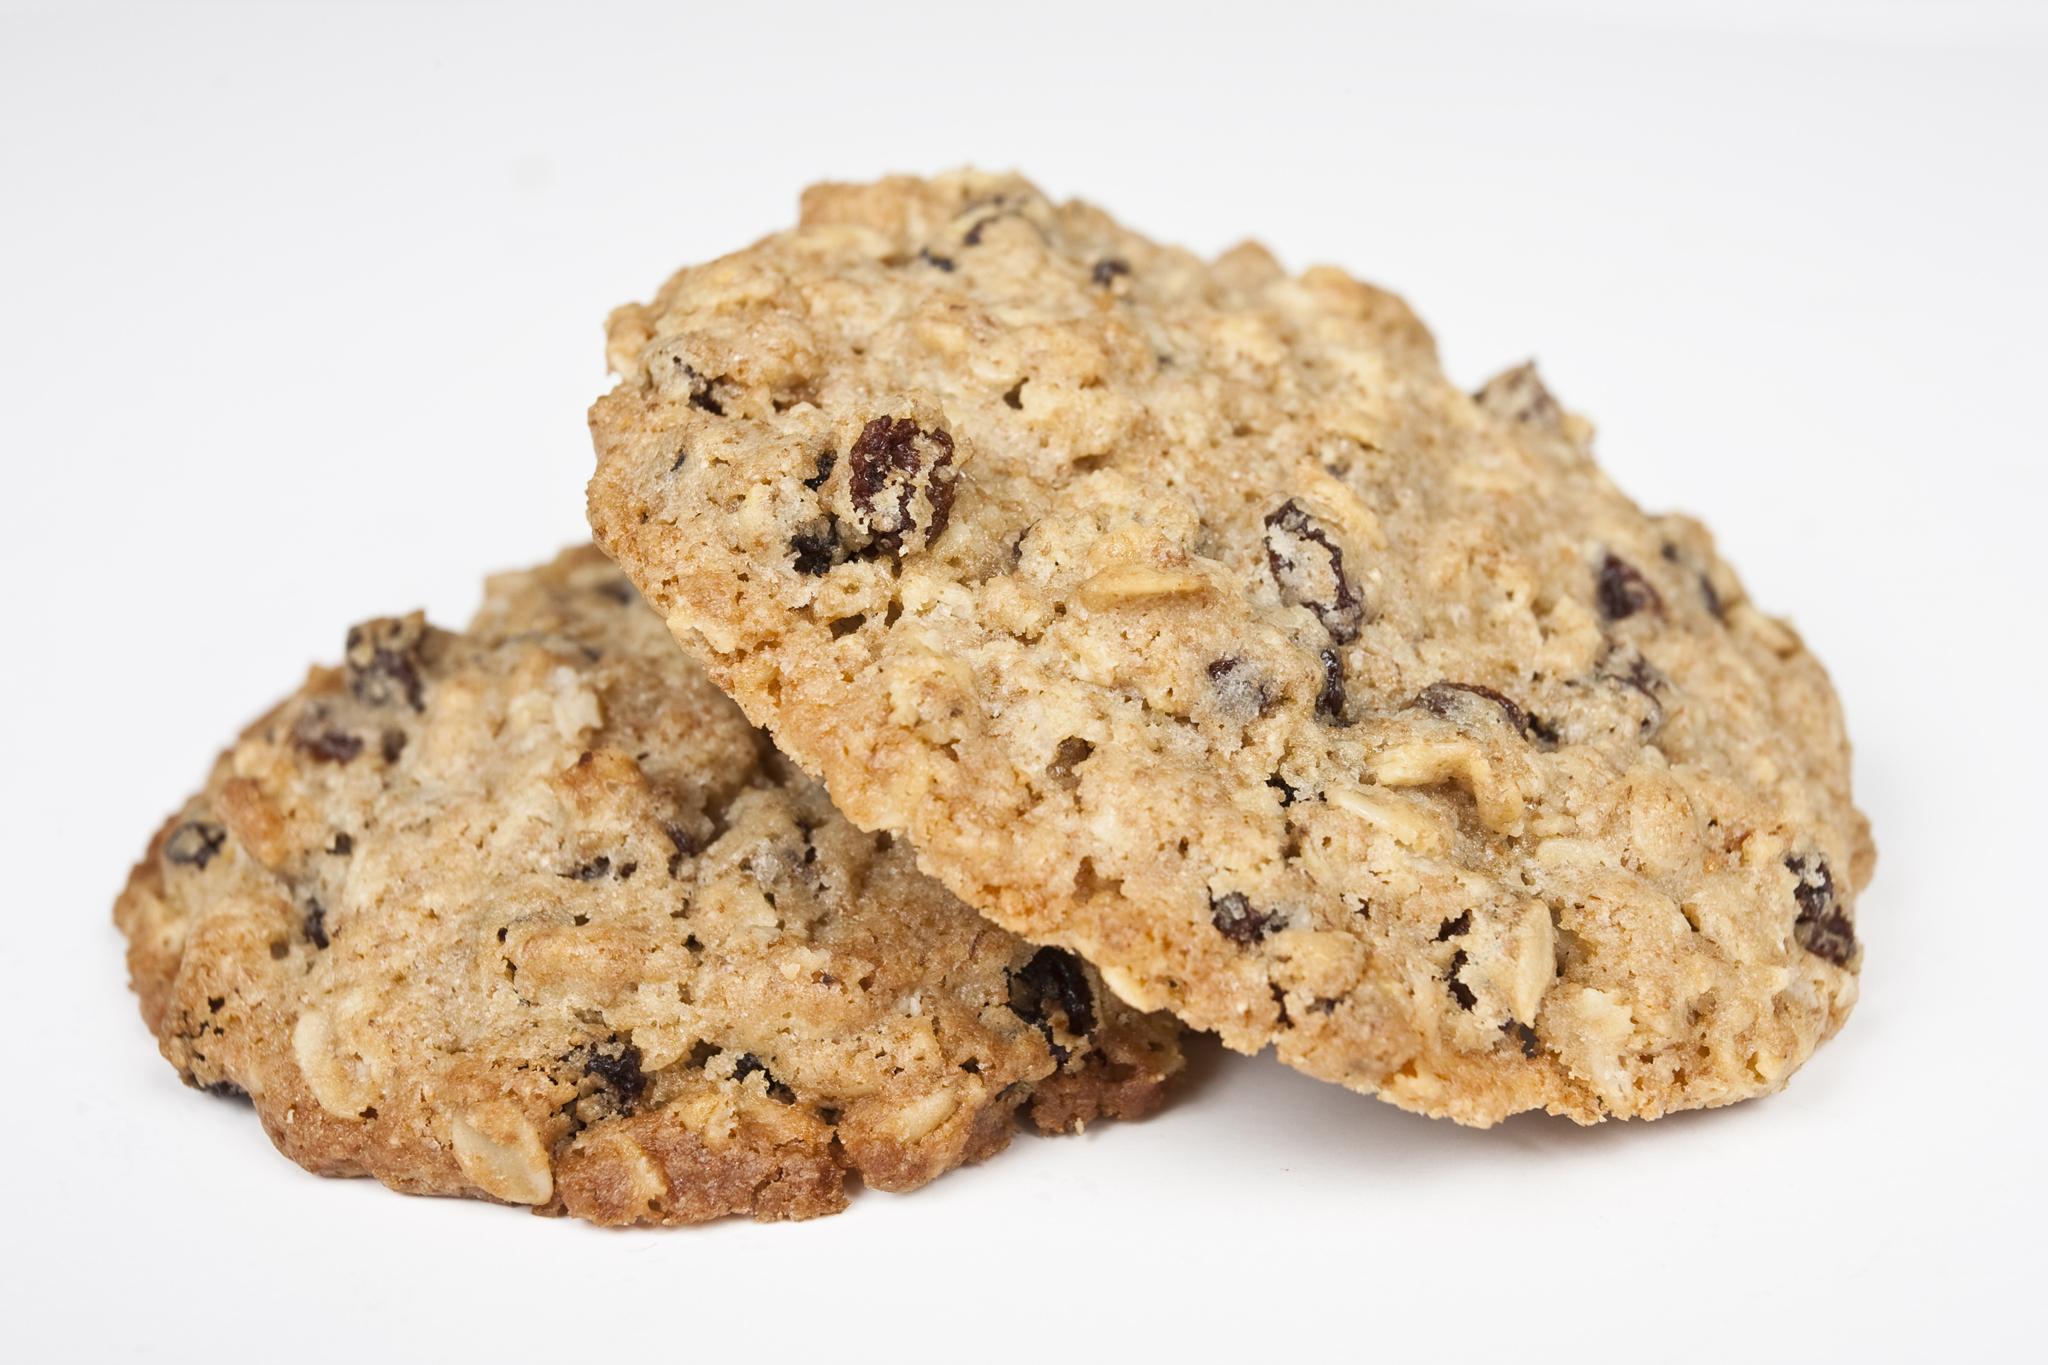 Oatmeal raisin cookie from Kahve